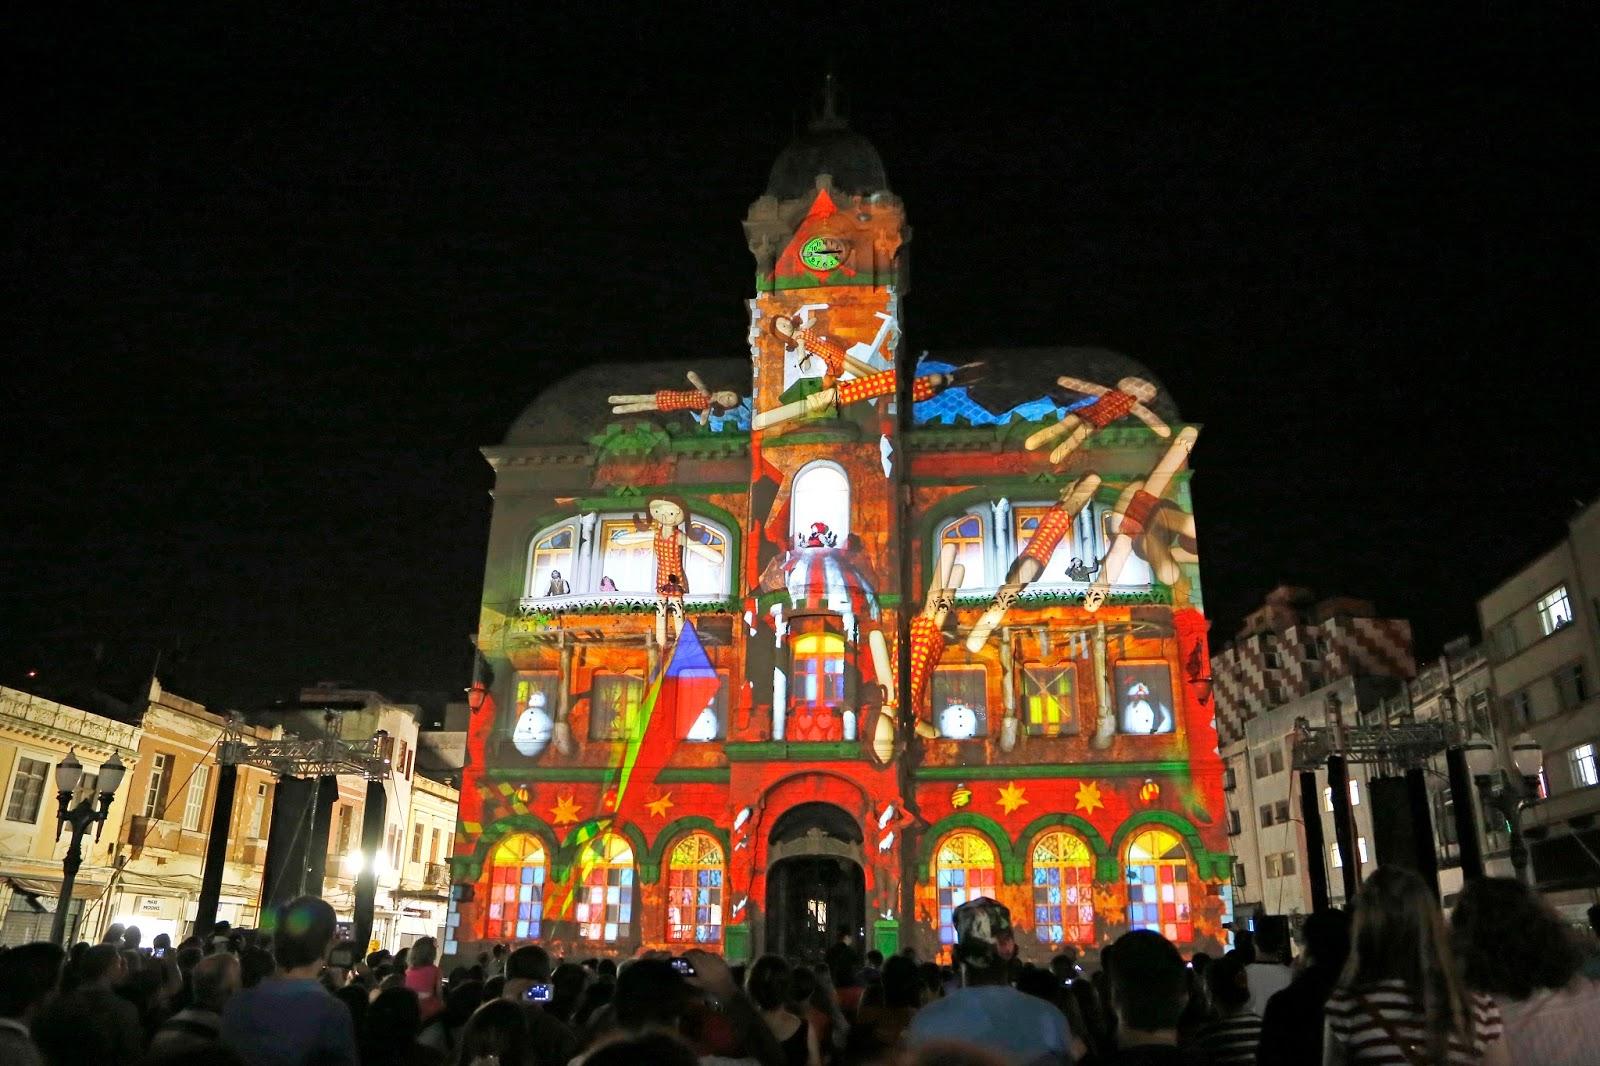 O Natal Luz dos Pinhais de Curitiba